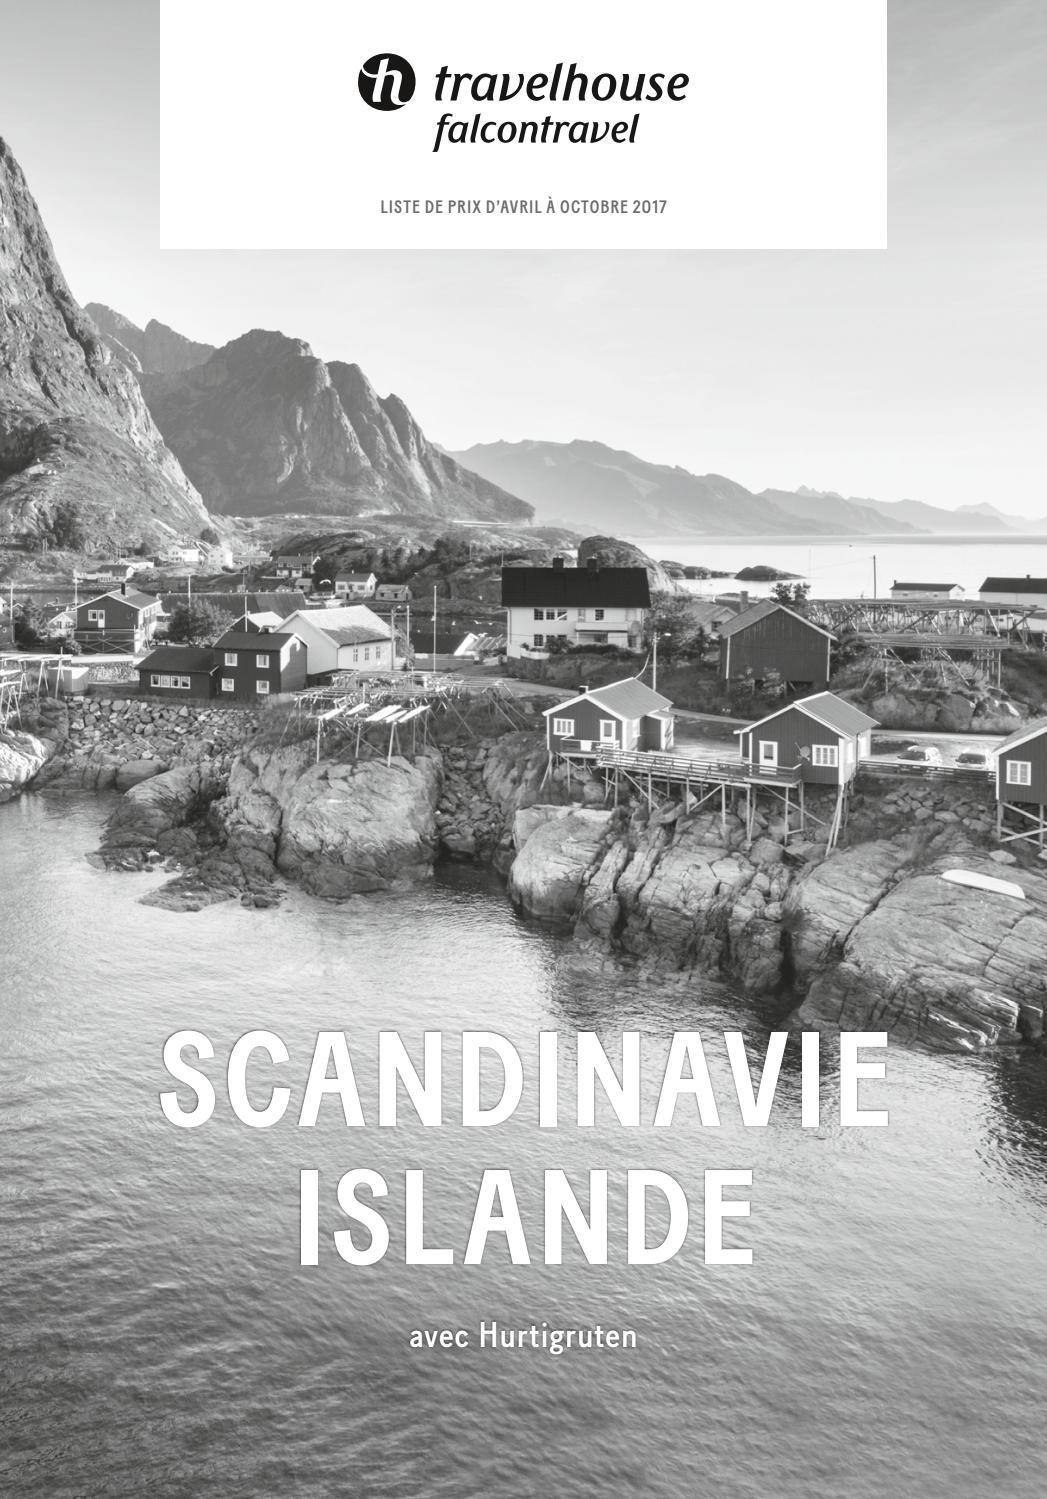 liste de prix travelhouse scandinavie et islande d 39 avril octobre 2017 by hotelplan suisse. Black Bedroom Furniture Sets. Home Design Ideas